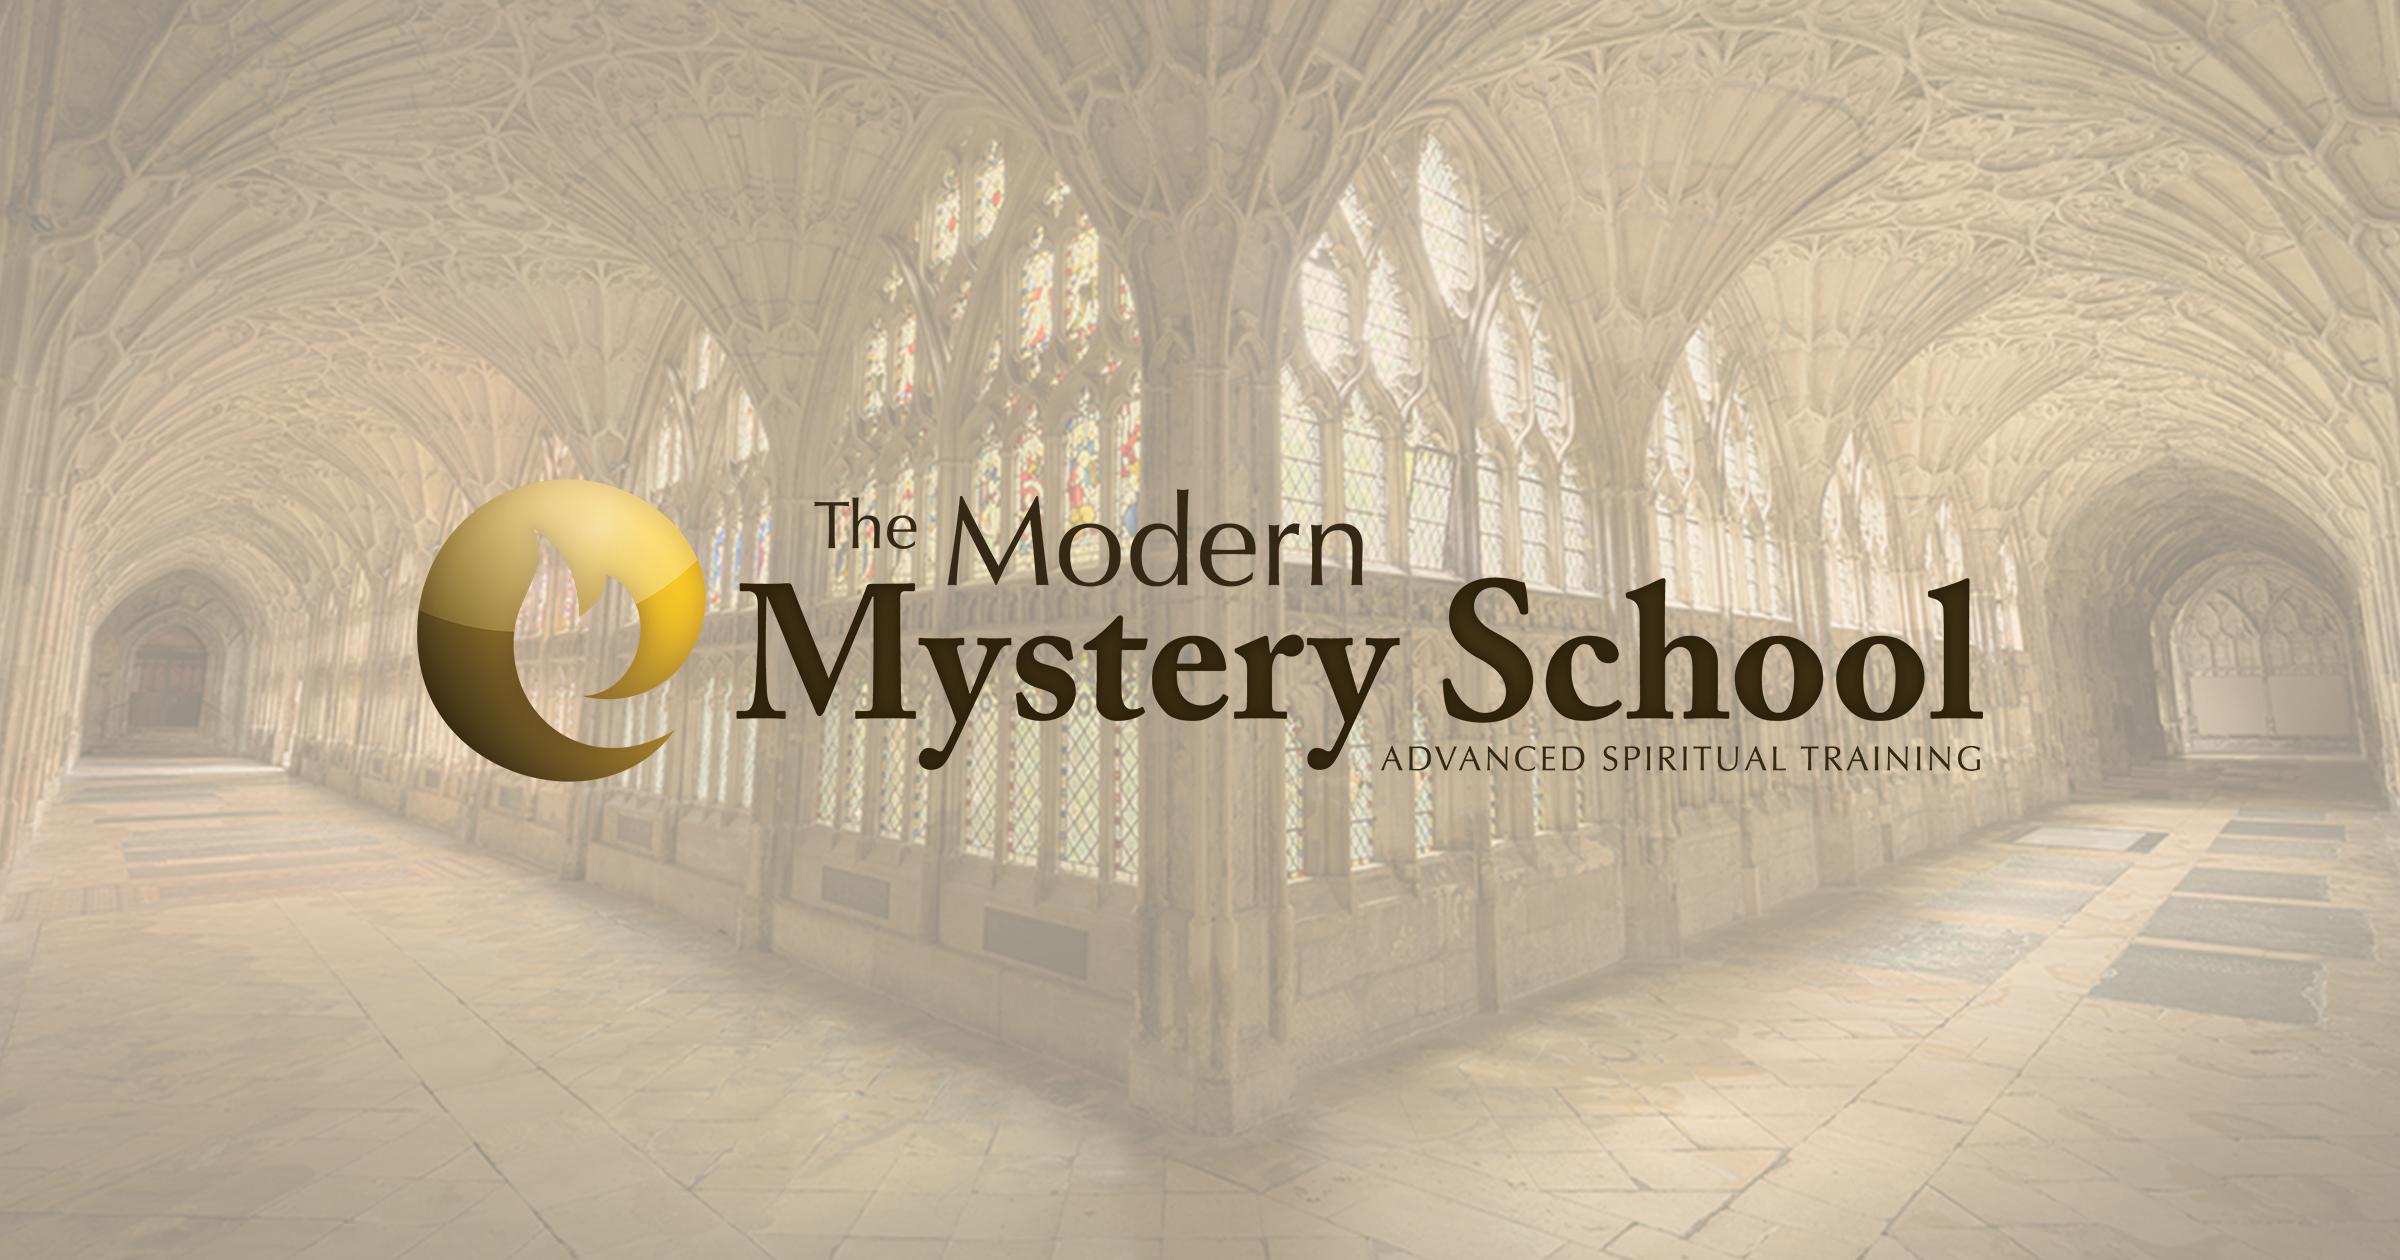 The Modern Mystery School